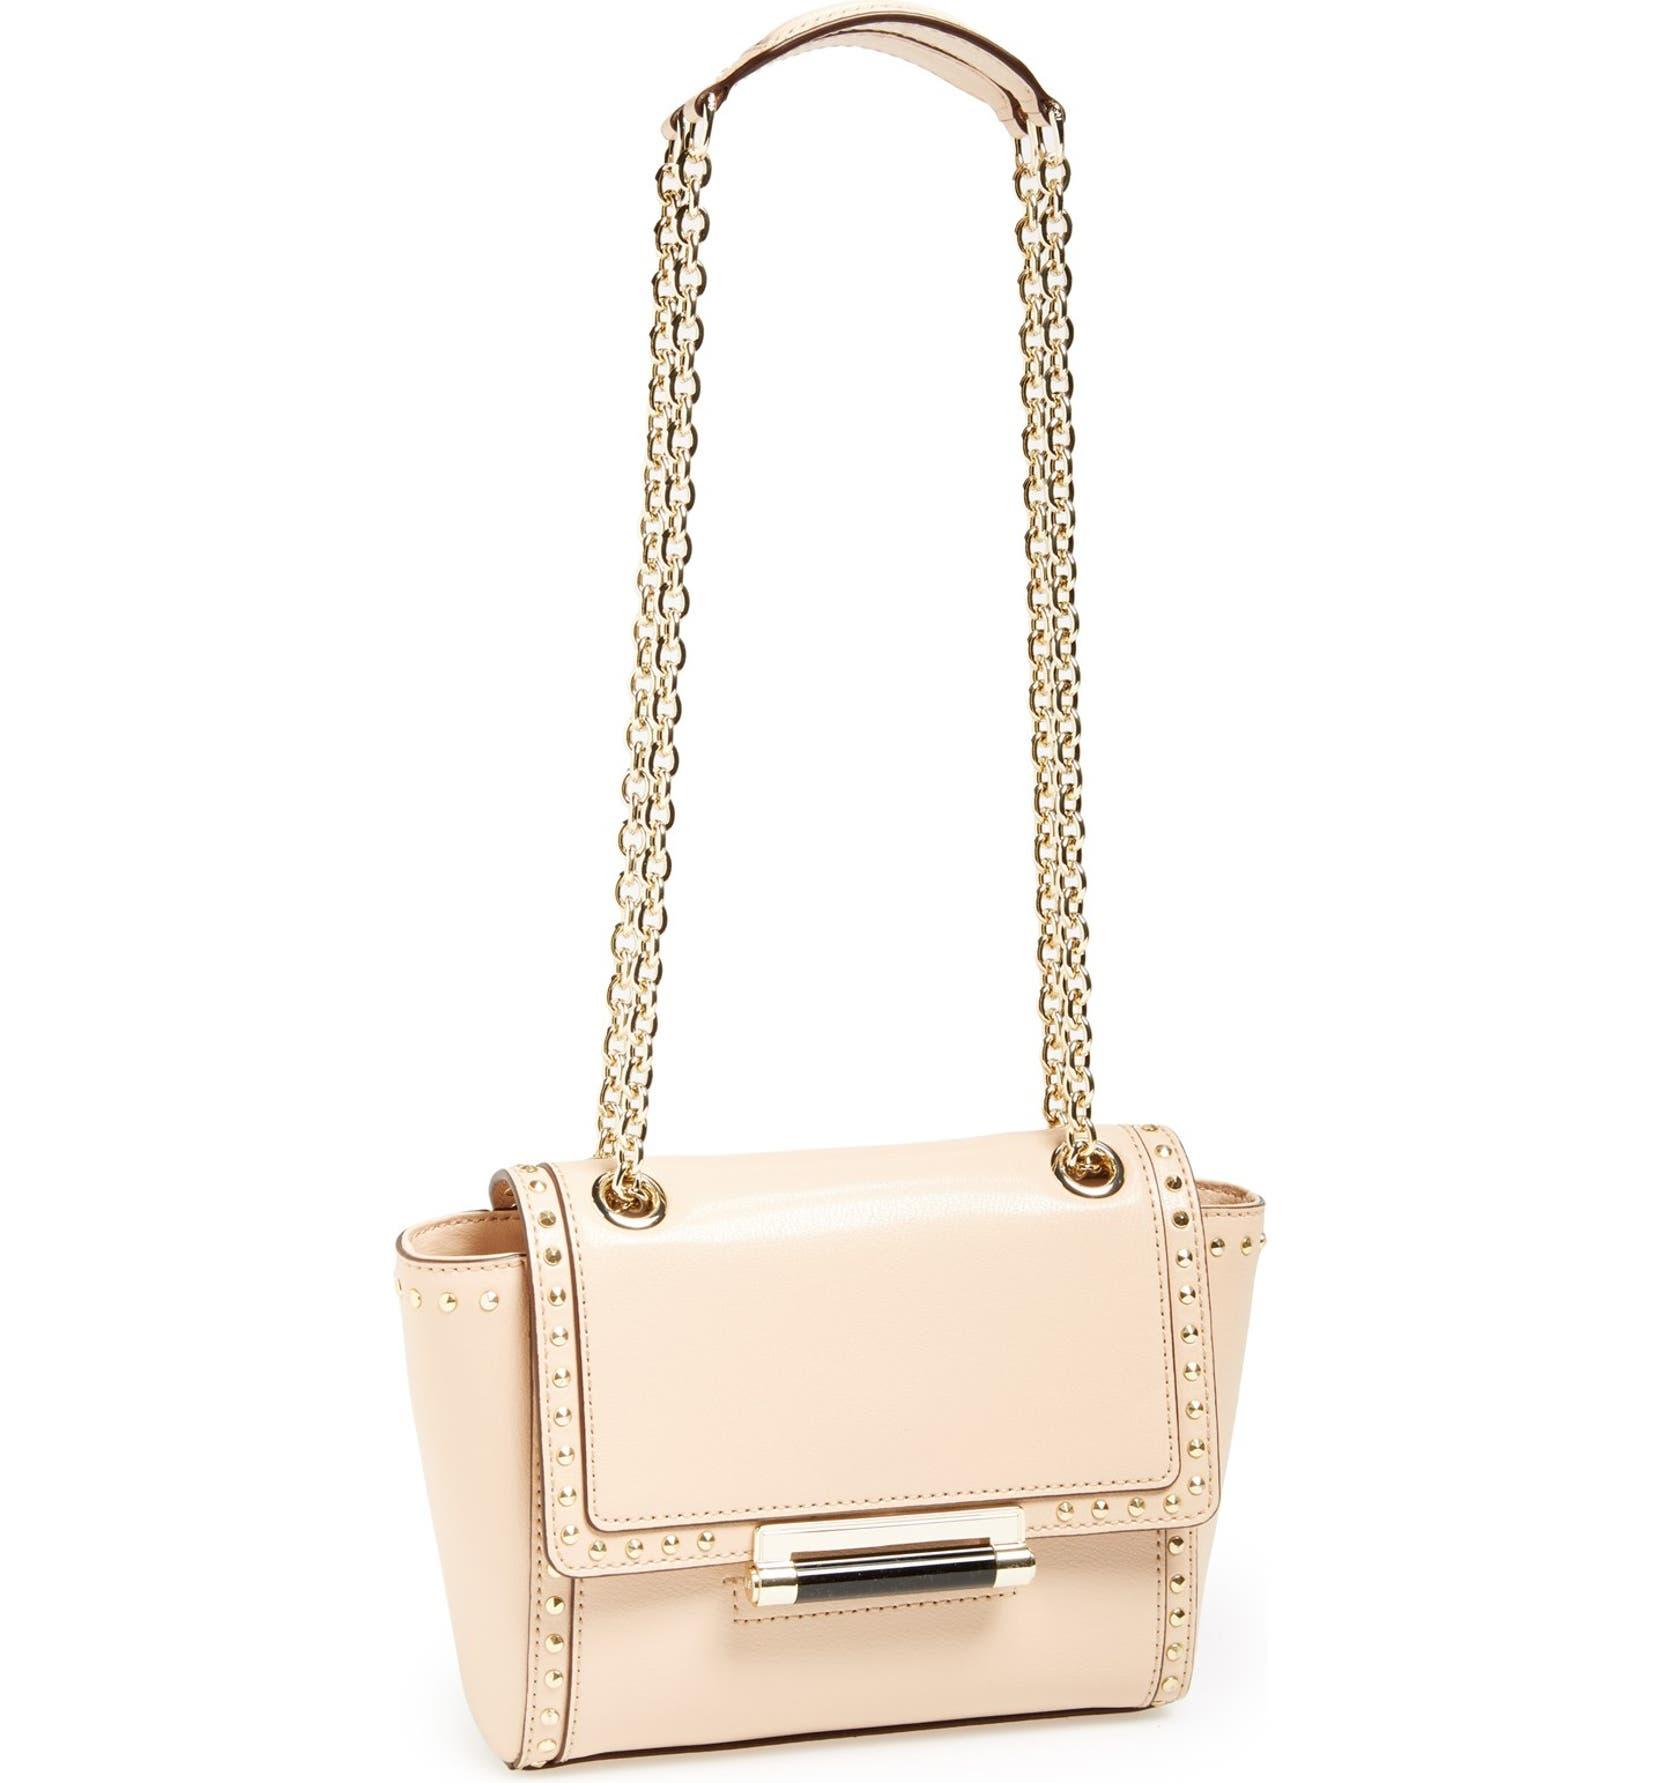 32c9ed8c36b1 Diane von Furstenberg 'Mini 440' Stud Leather Crossbody Bag | Nordstrom